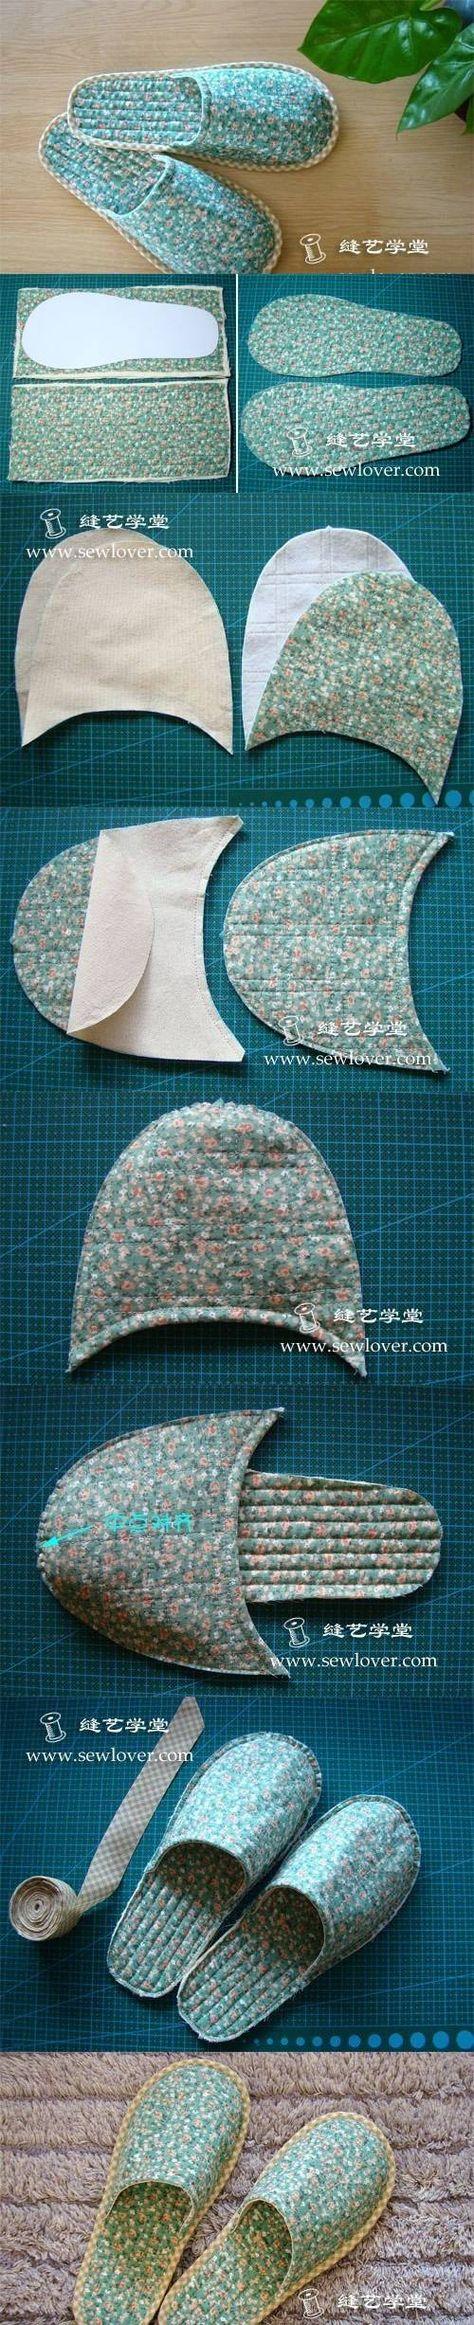 DIY Sew Slipper DIY Sew Slipper